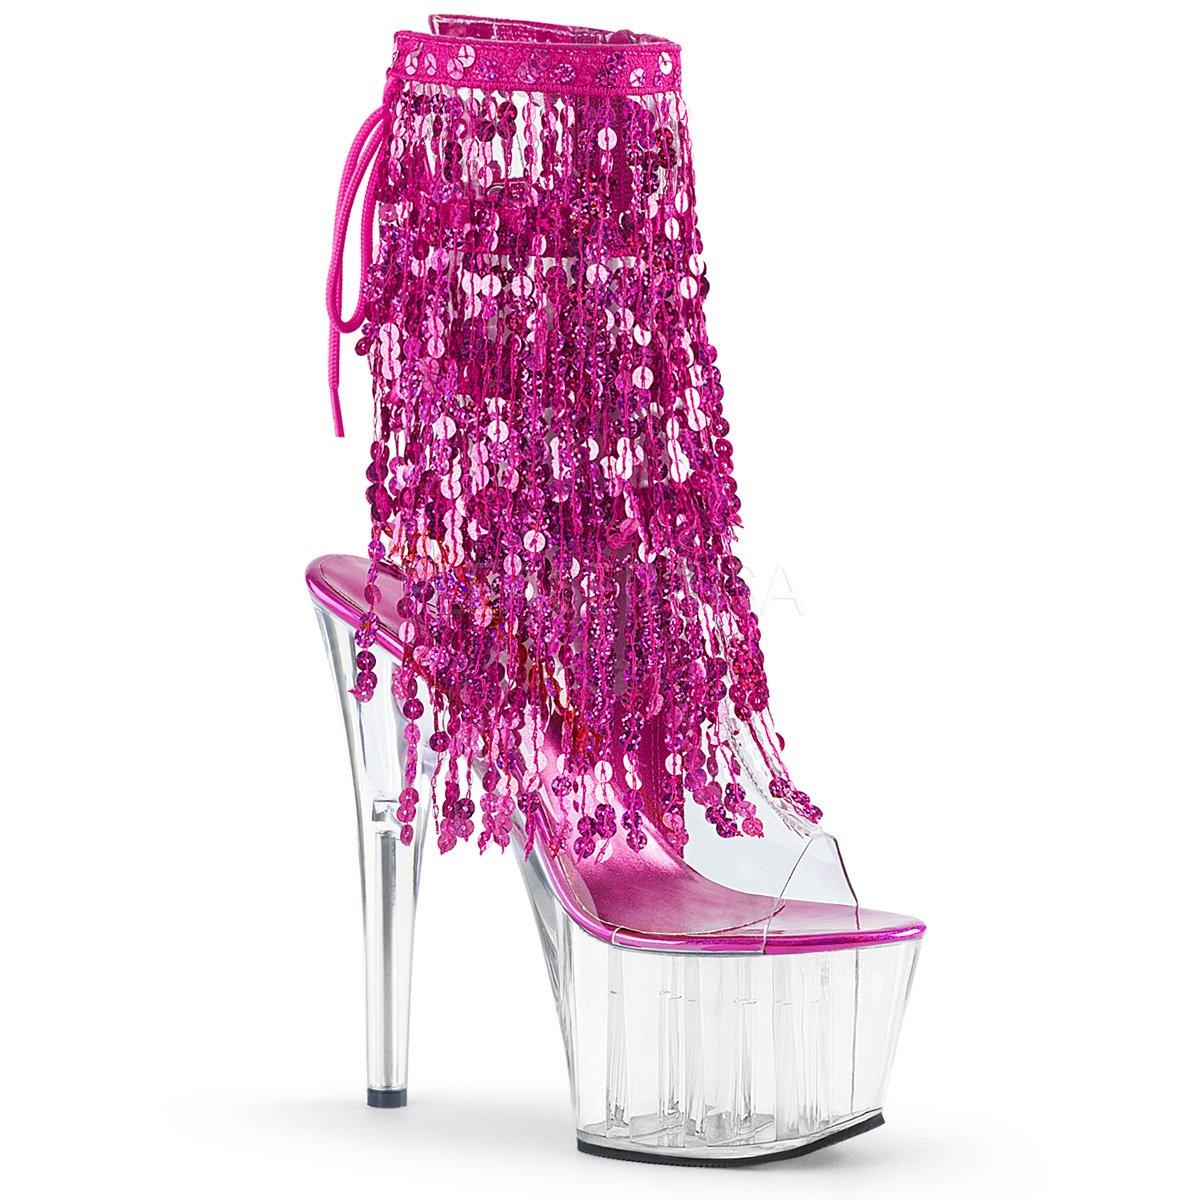 Pleaser Women's Ado1017sqf/c-s/c Ankle Bootie B01N38LDJ6 8 B(M) US|Clr-h. Pink Holo/Clr